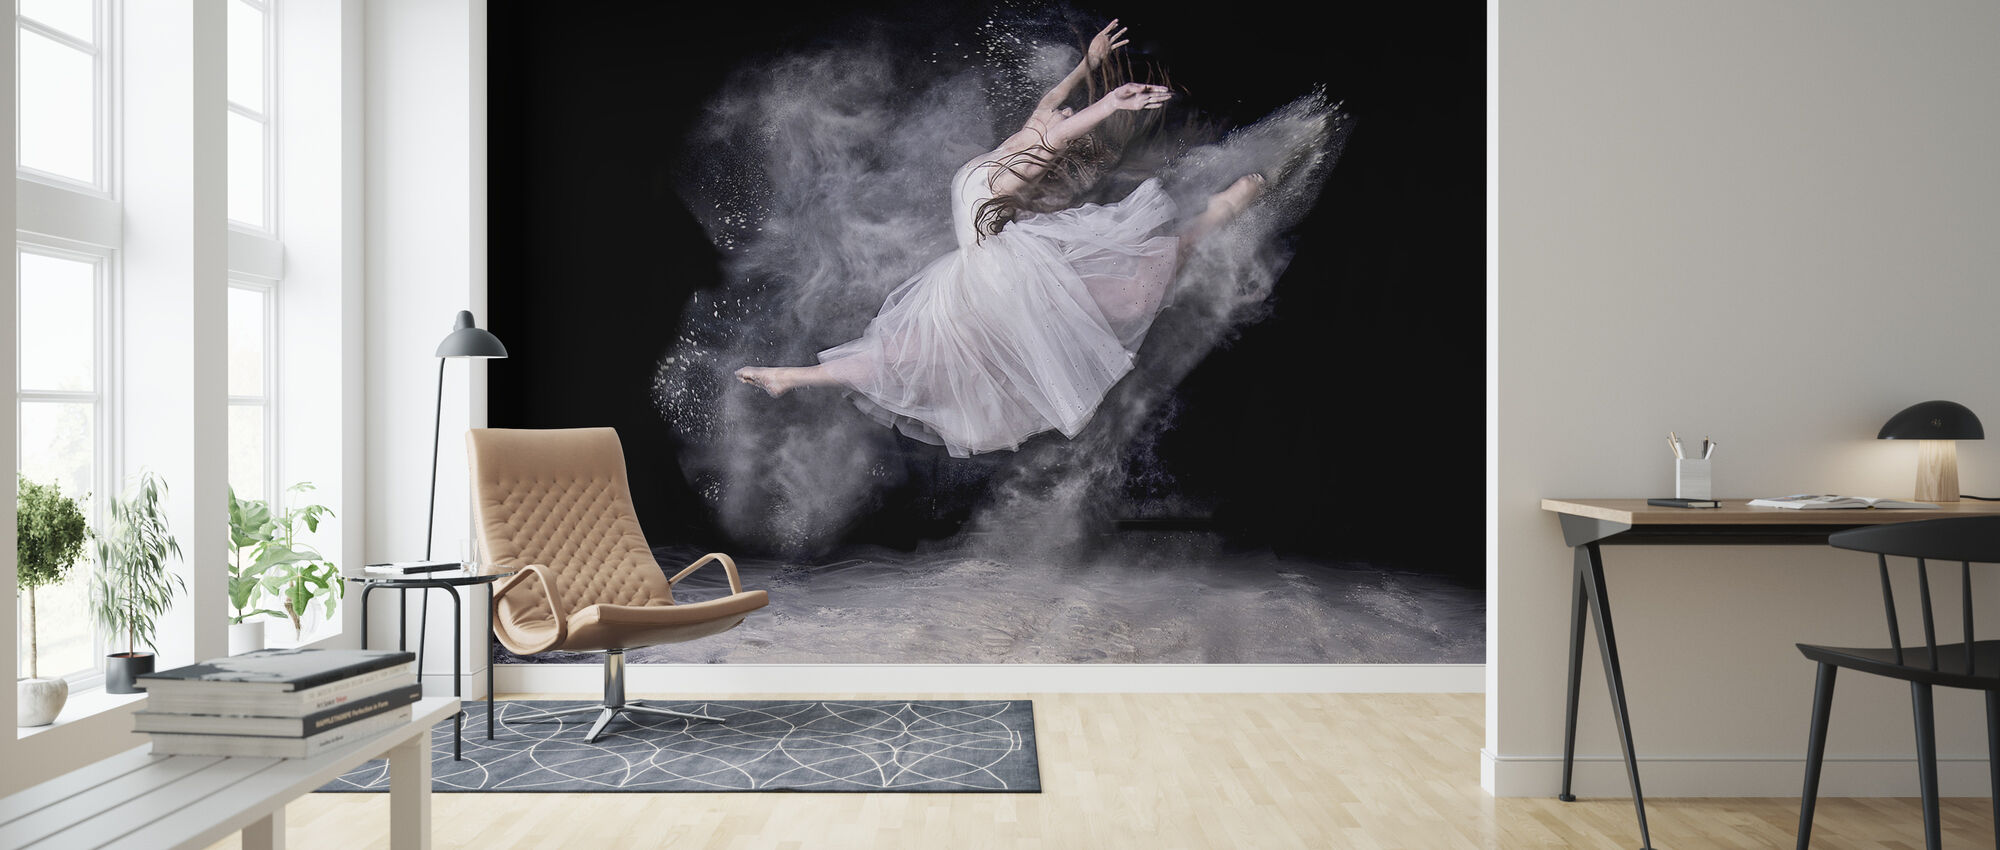 Cloud Dancer - Wallpaper - Living Room